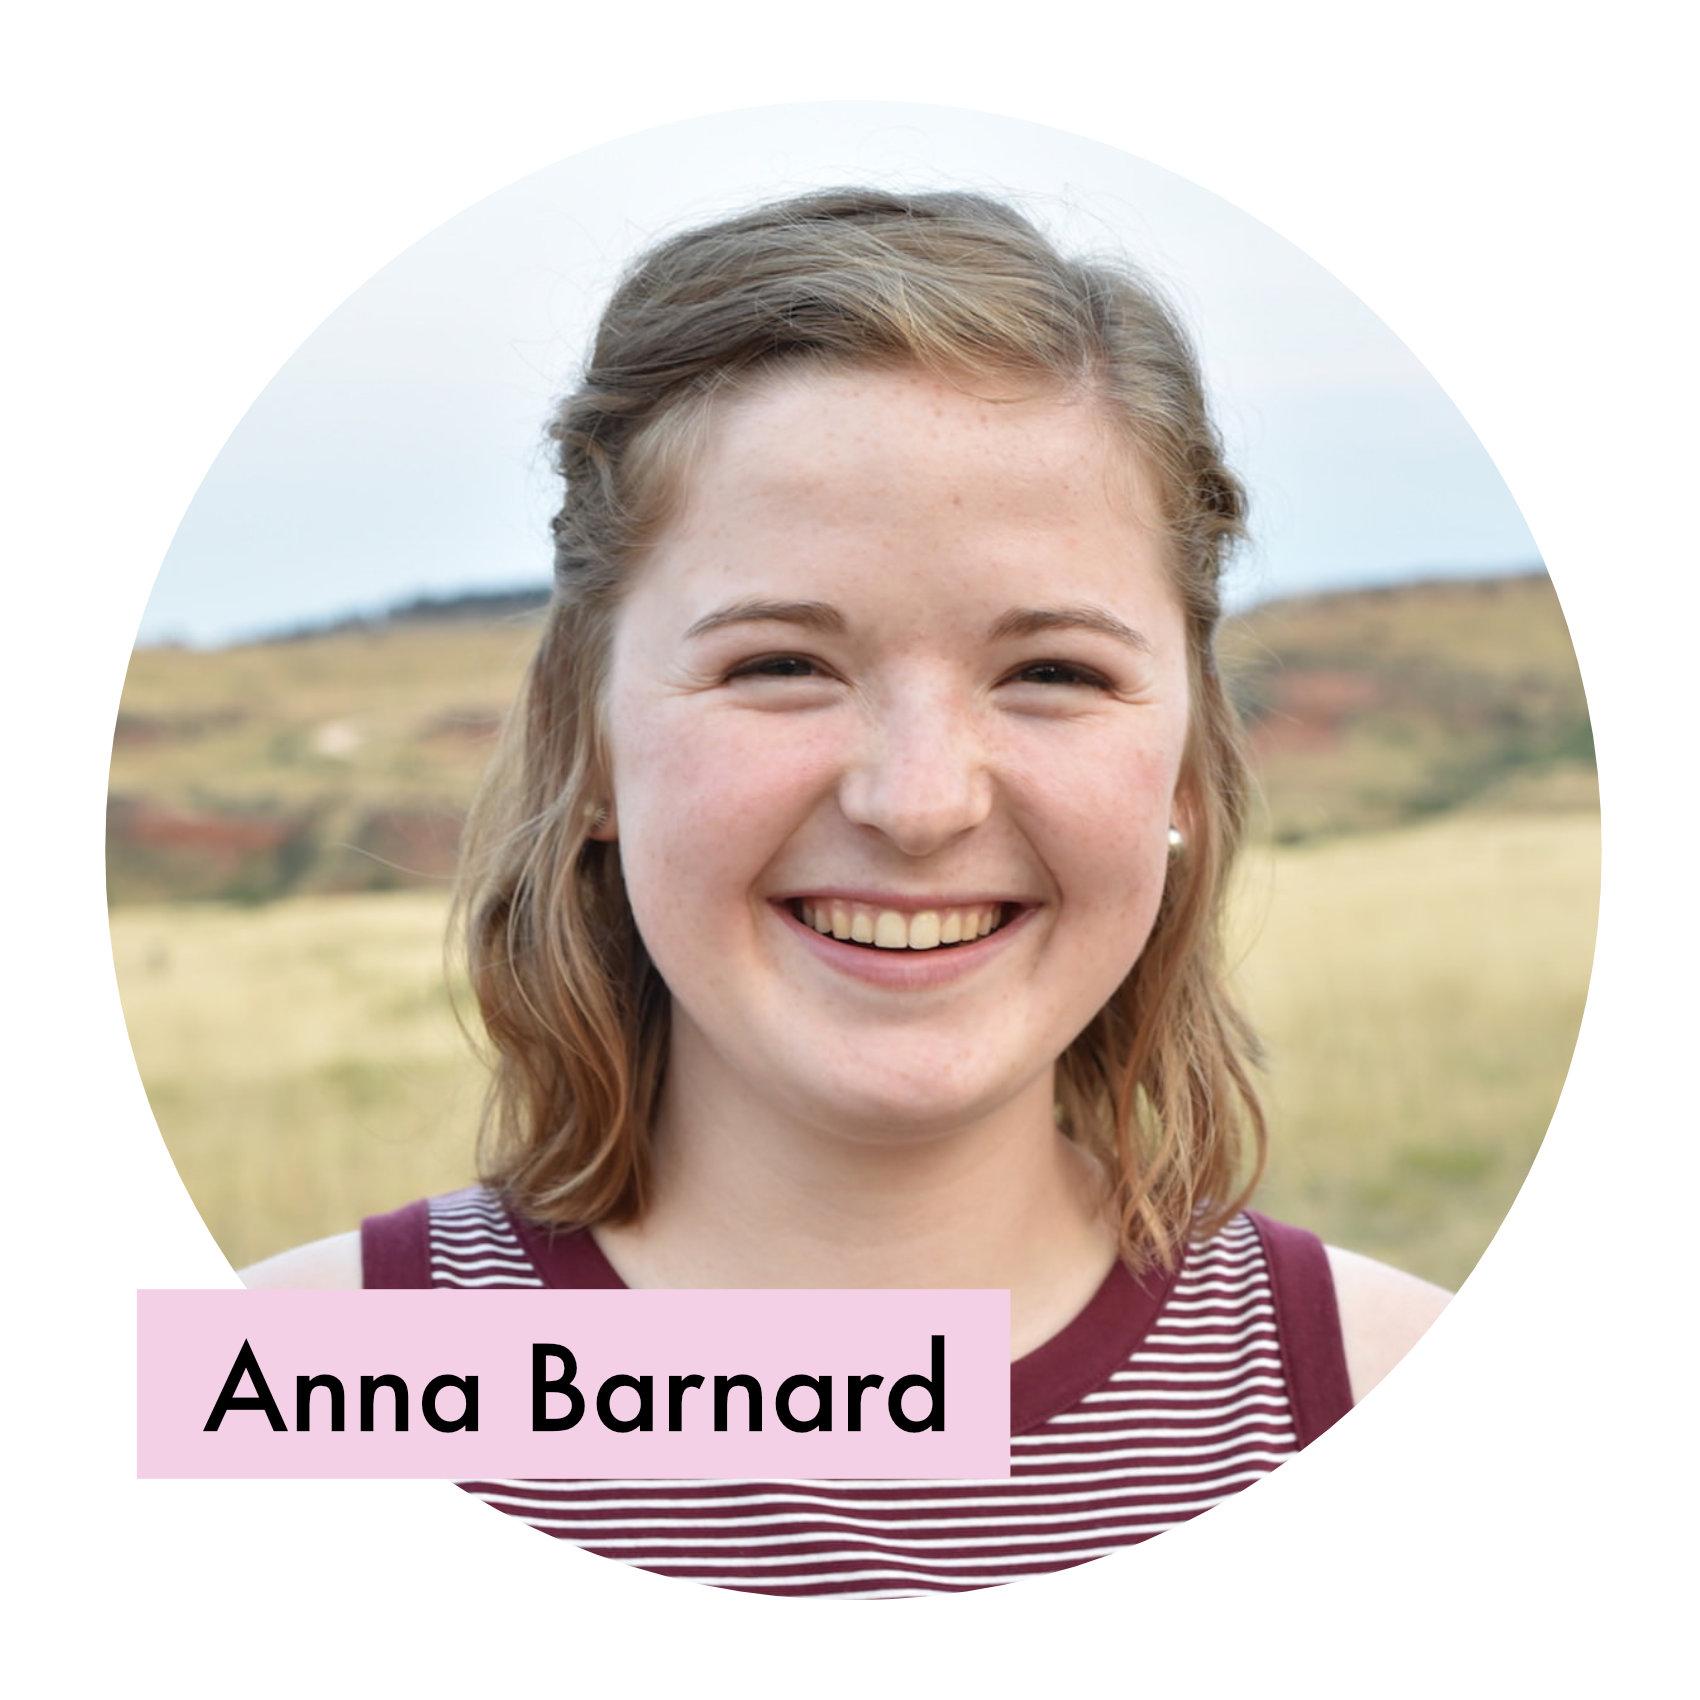 anna barnard round headshot.jpg